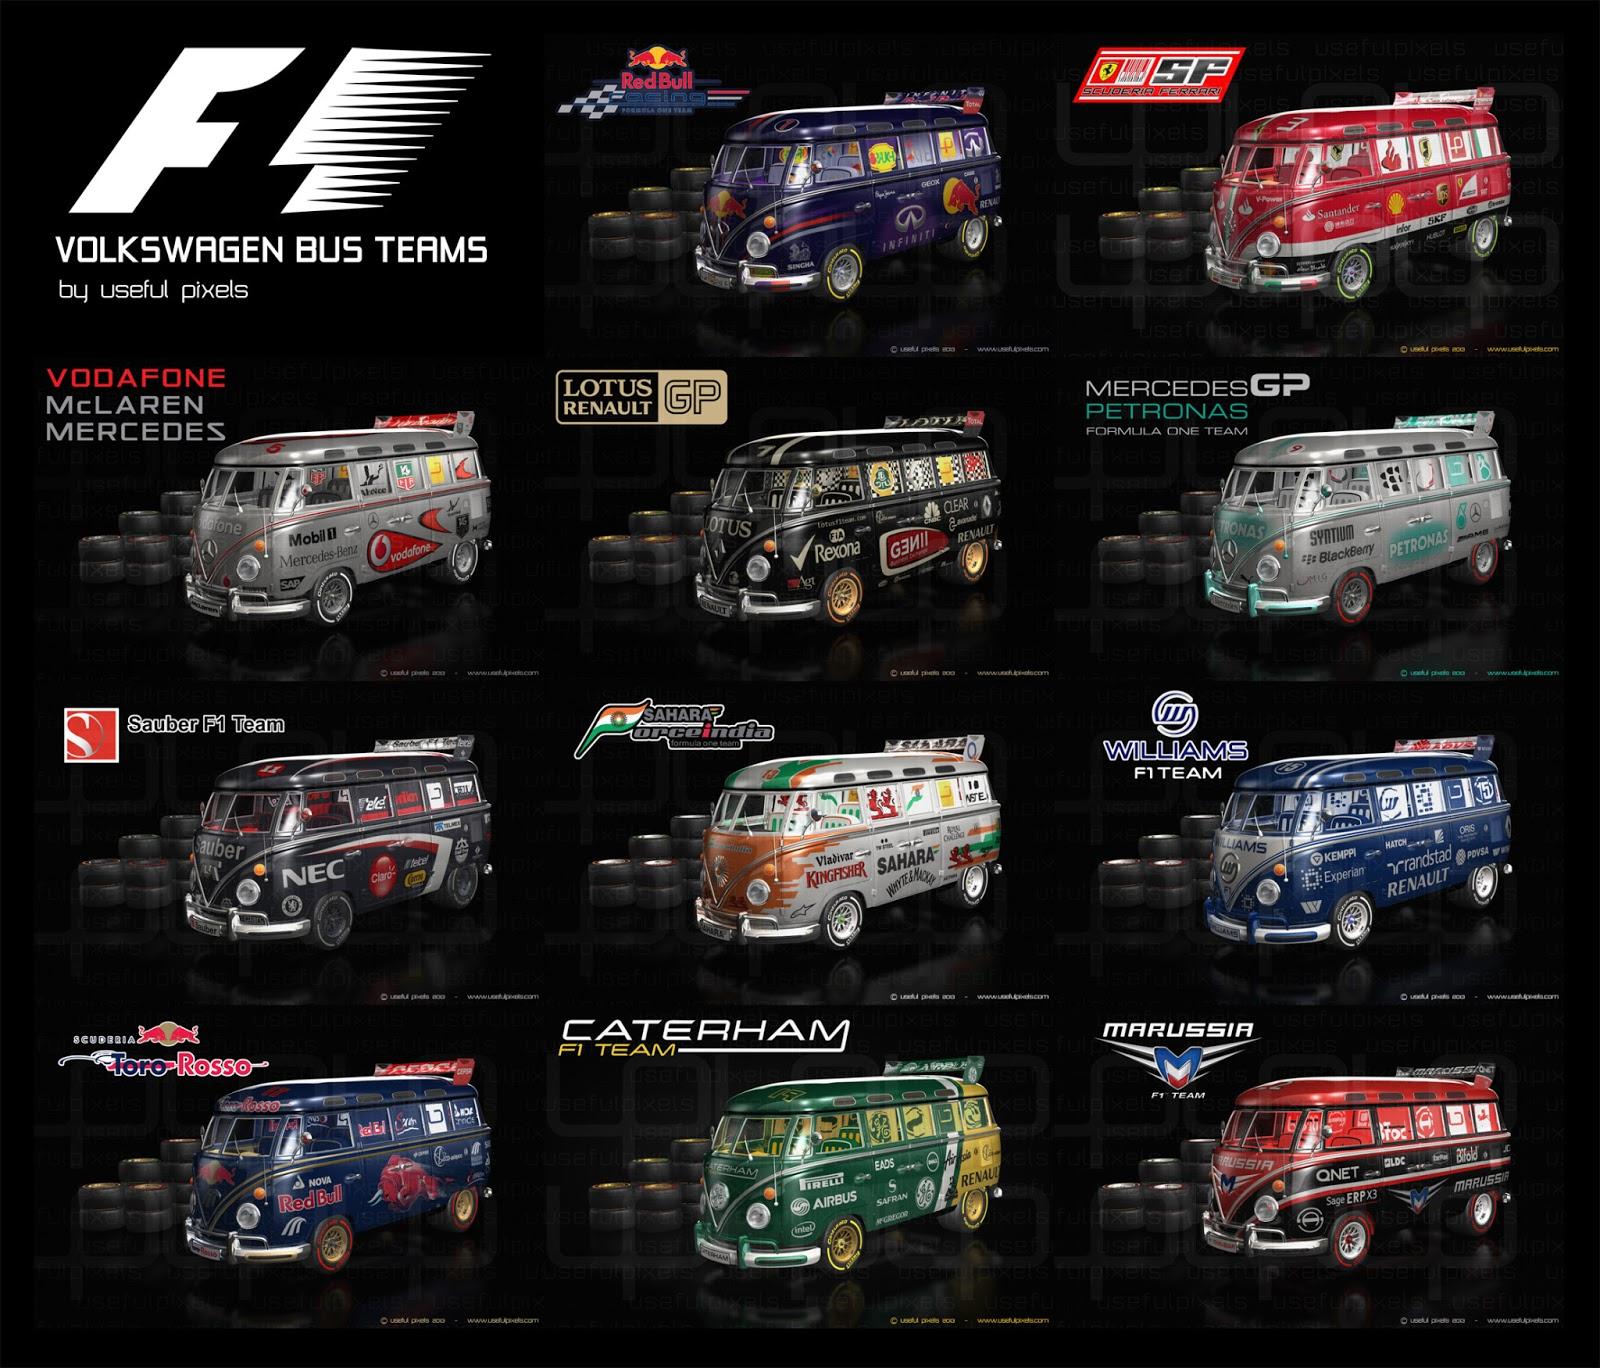 Formula One Team Vw Buses Racing Views